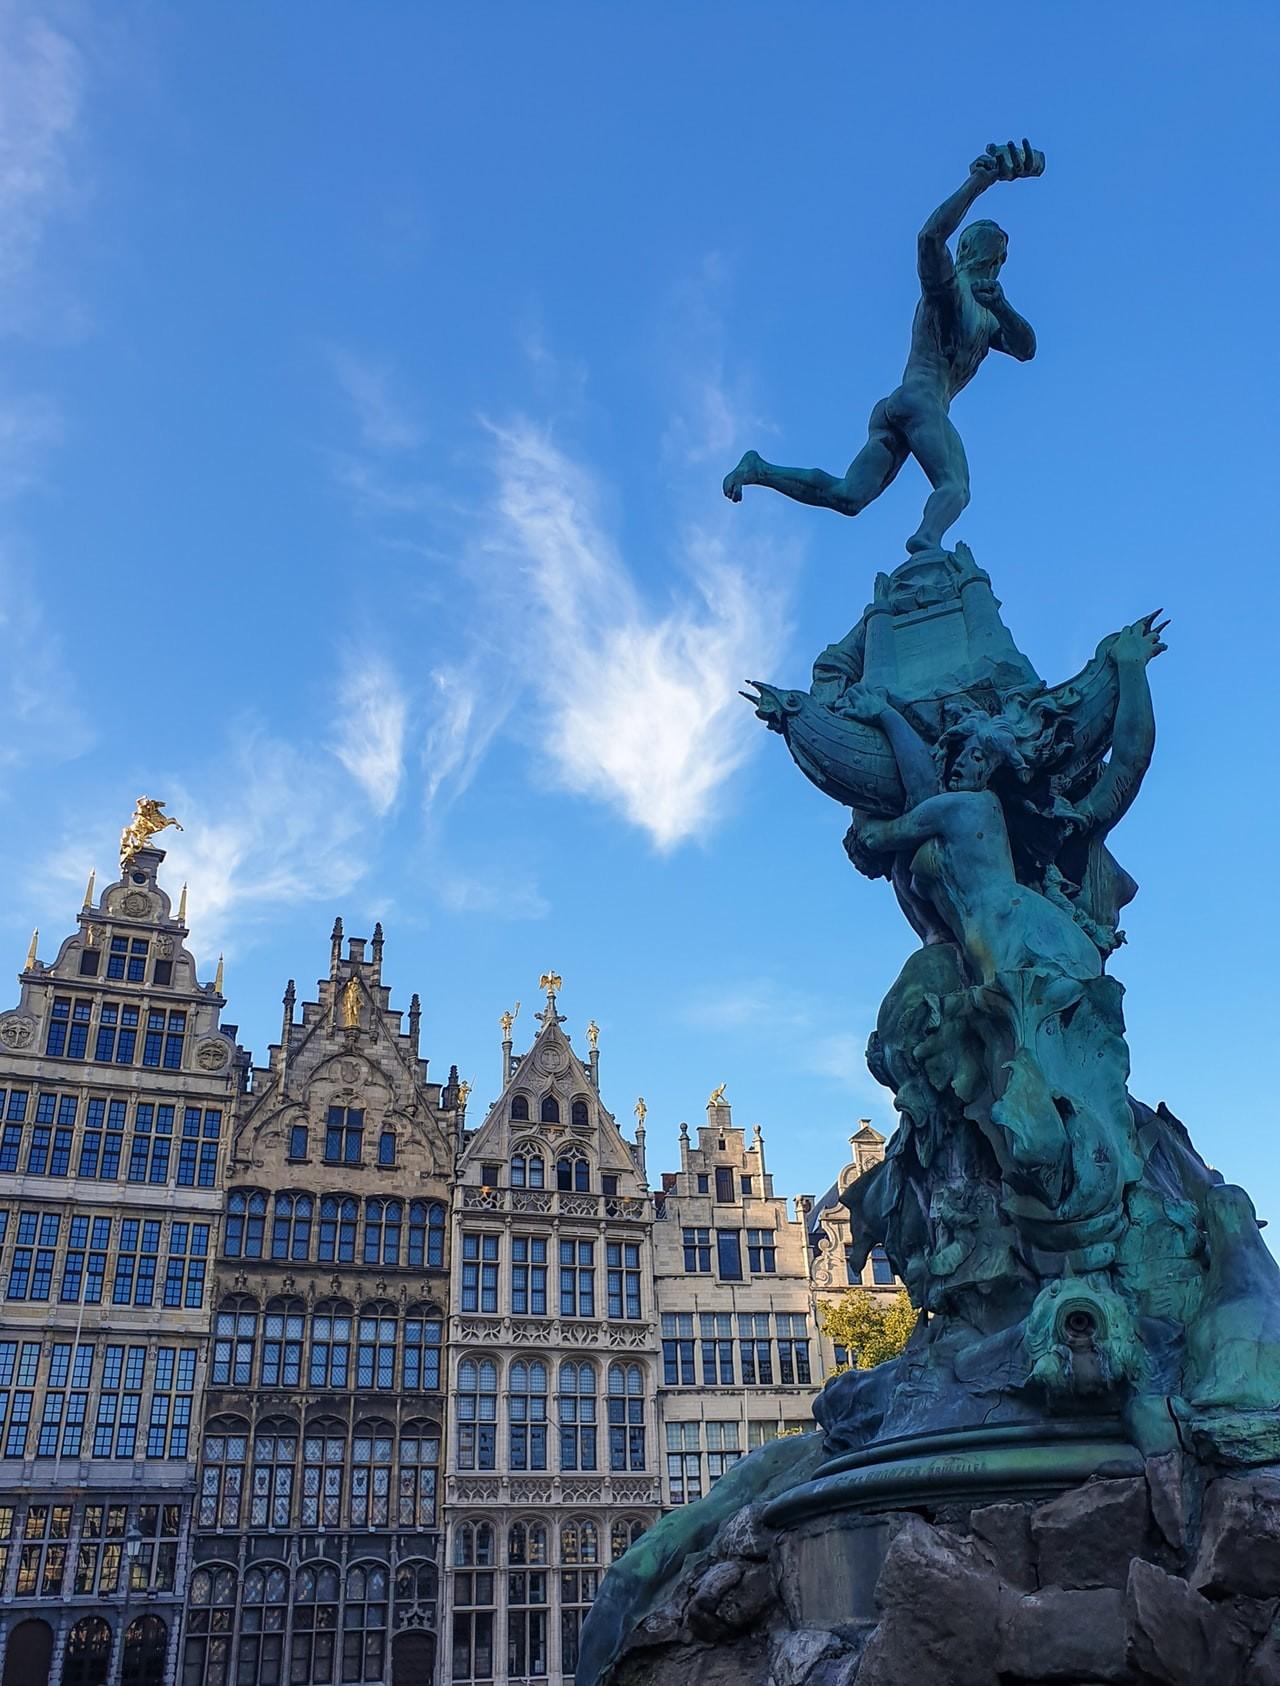 Esperienza ad Anversa, Belgio di Michael